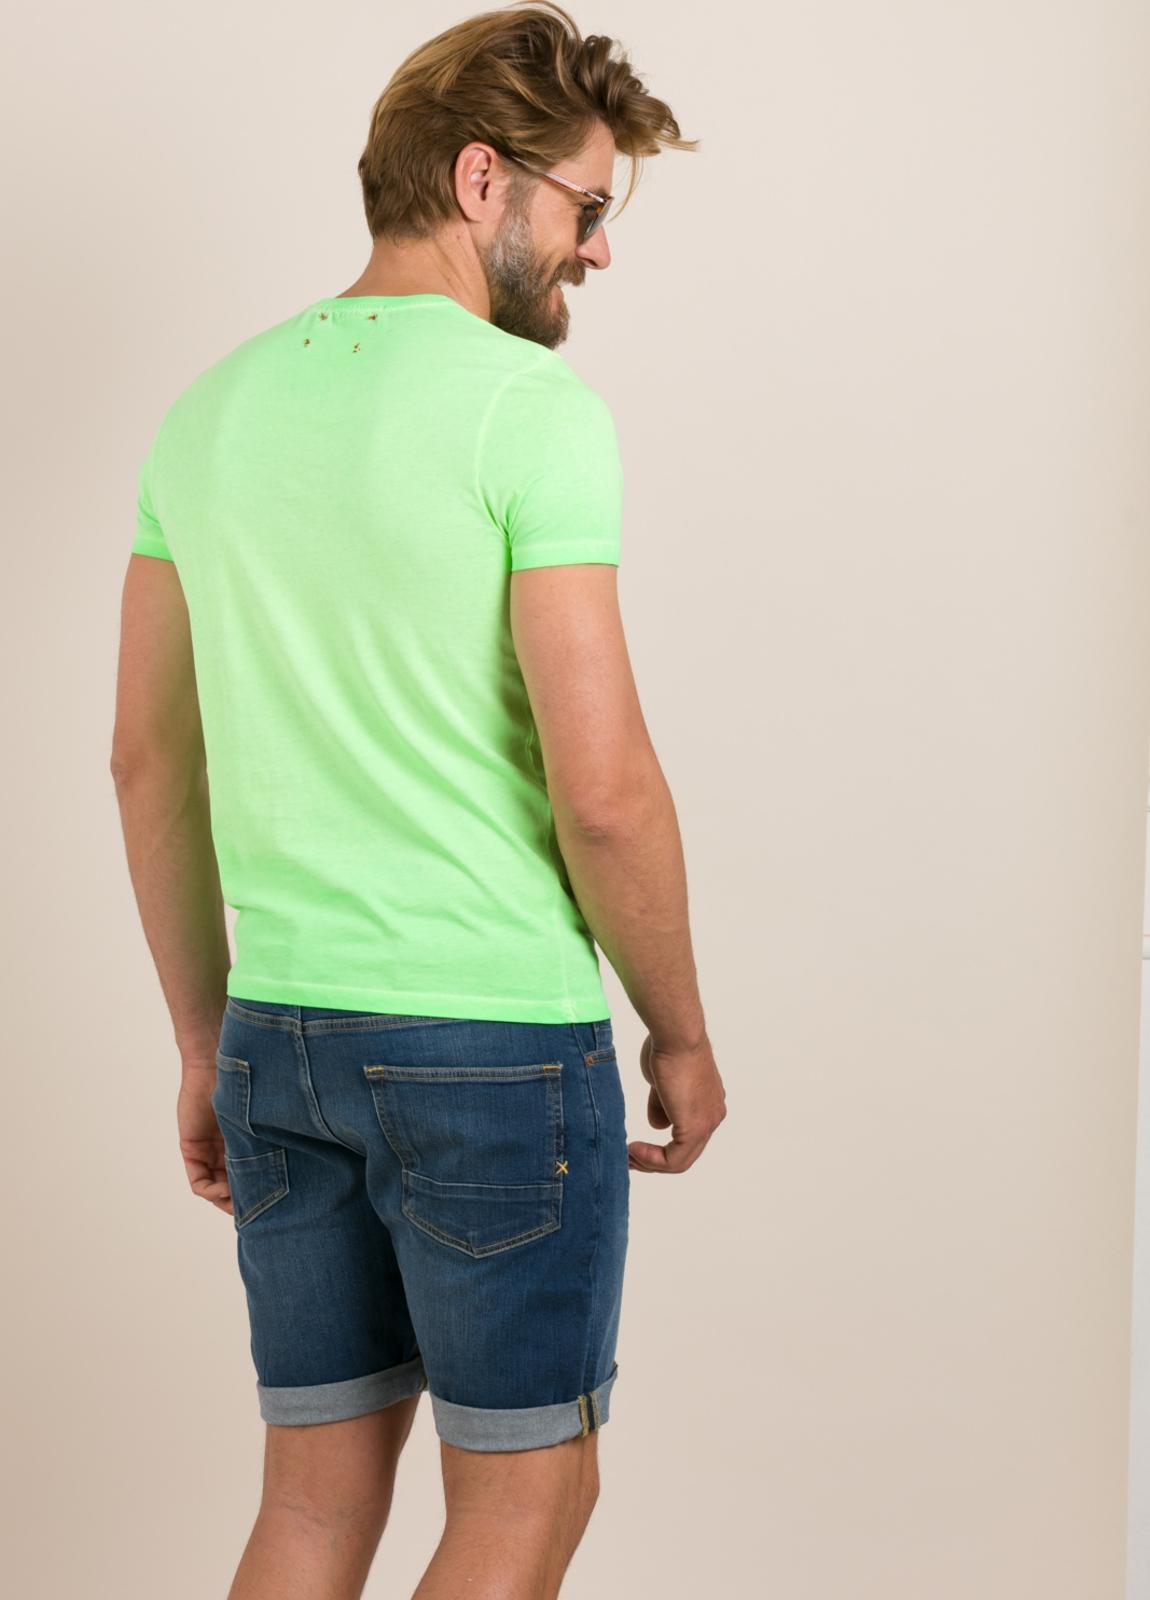 Camiseta TAKE A WAY dibujo vintage verde - Ítem1